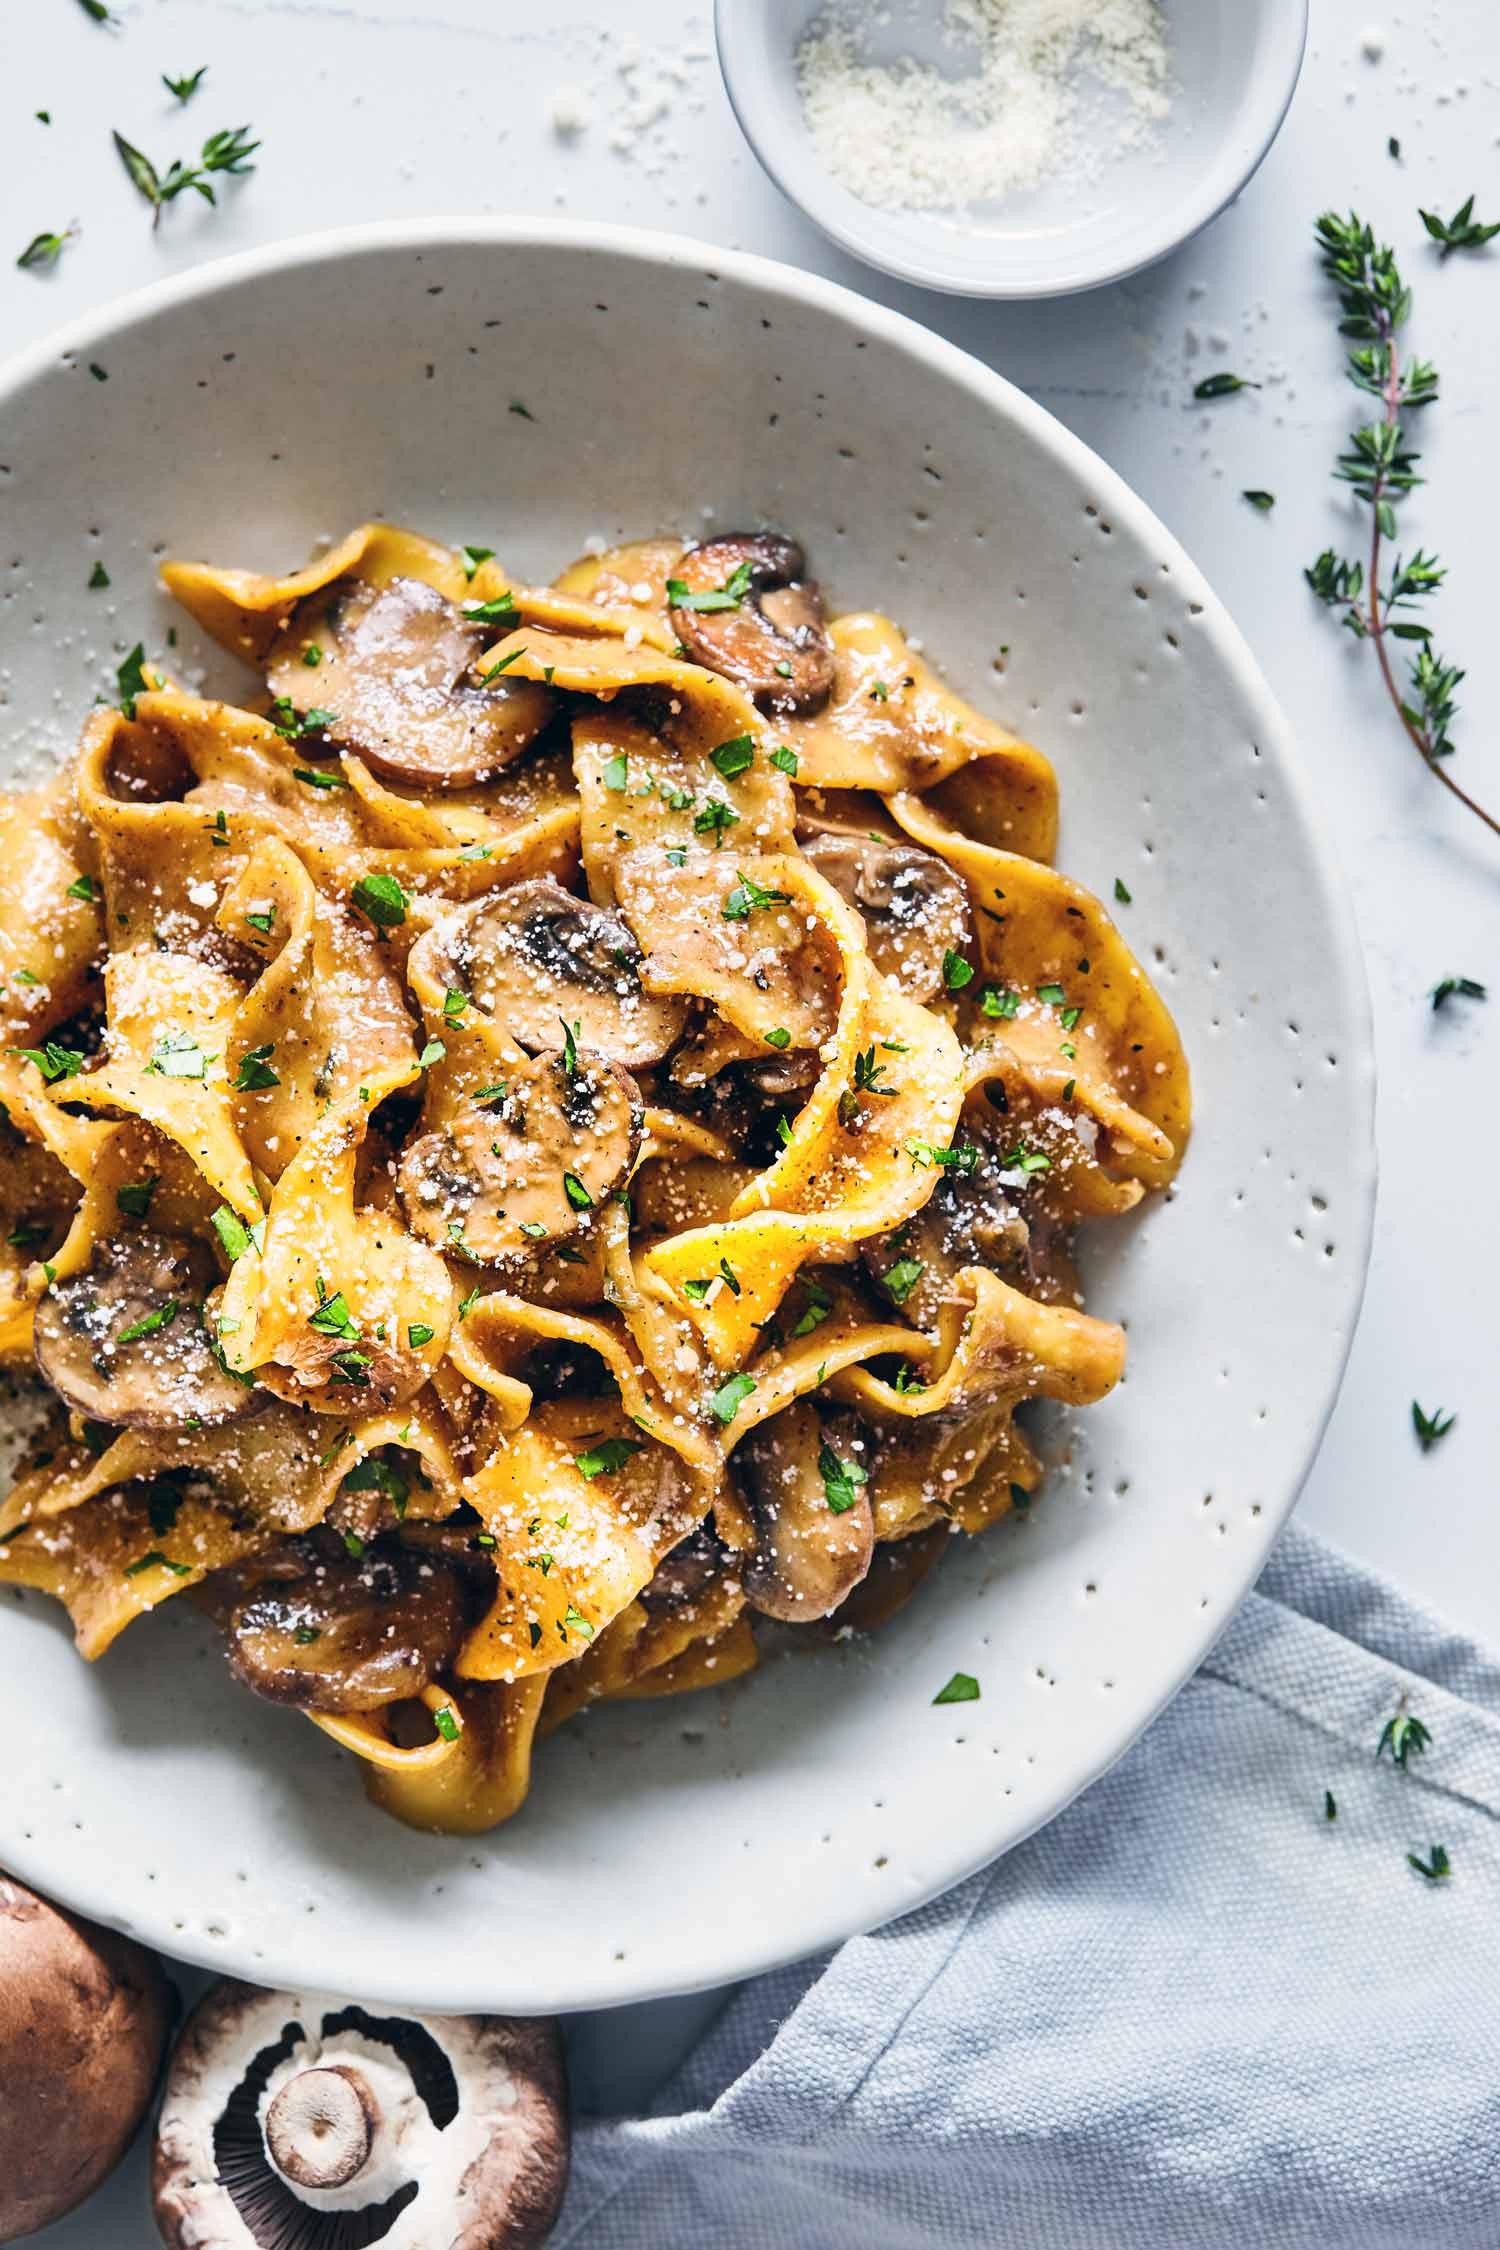 Mushroom Stroganoff   Evergreen Kitchen   Vegan & Gluten Free Options